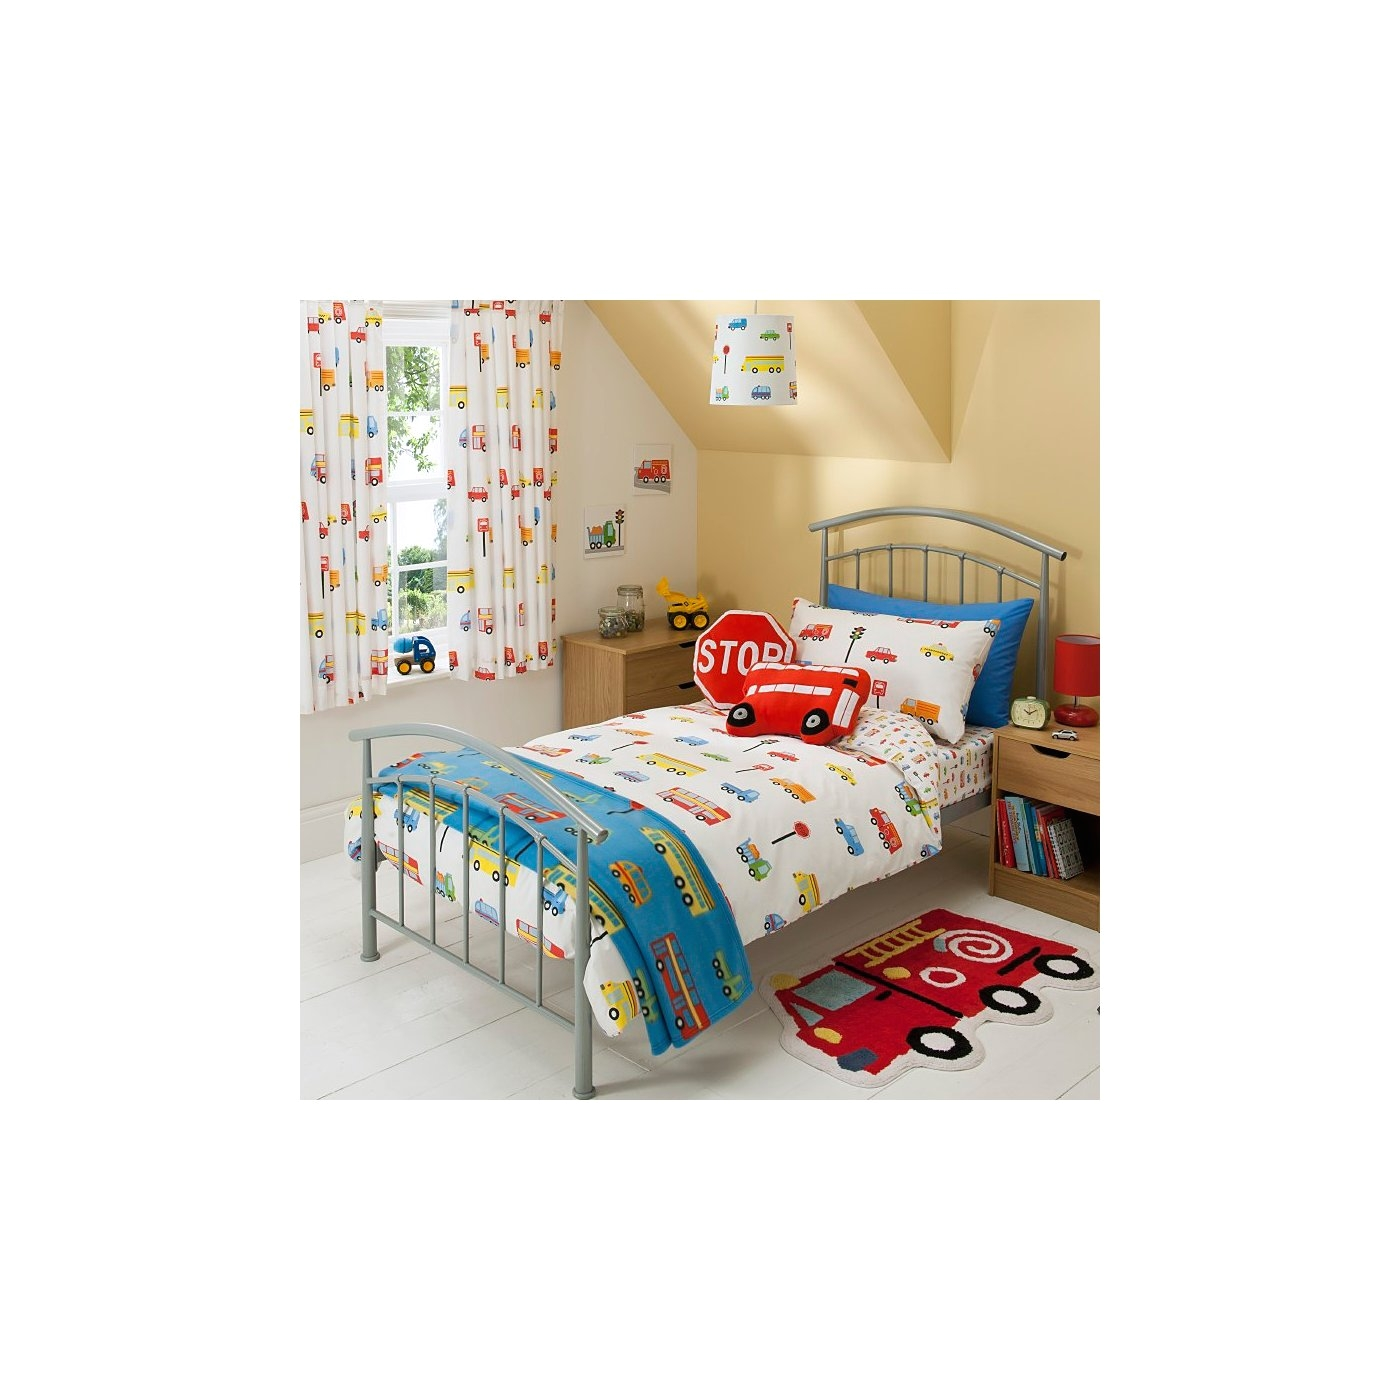 Asda Children S Floor Mats George Home Transport Bedroom Range Baby Bedding George at asda